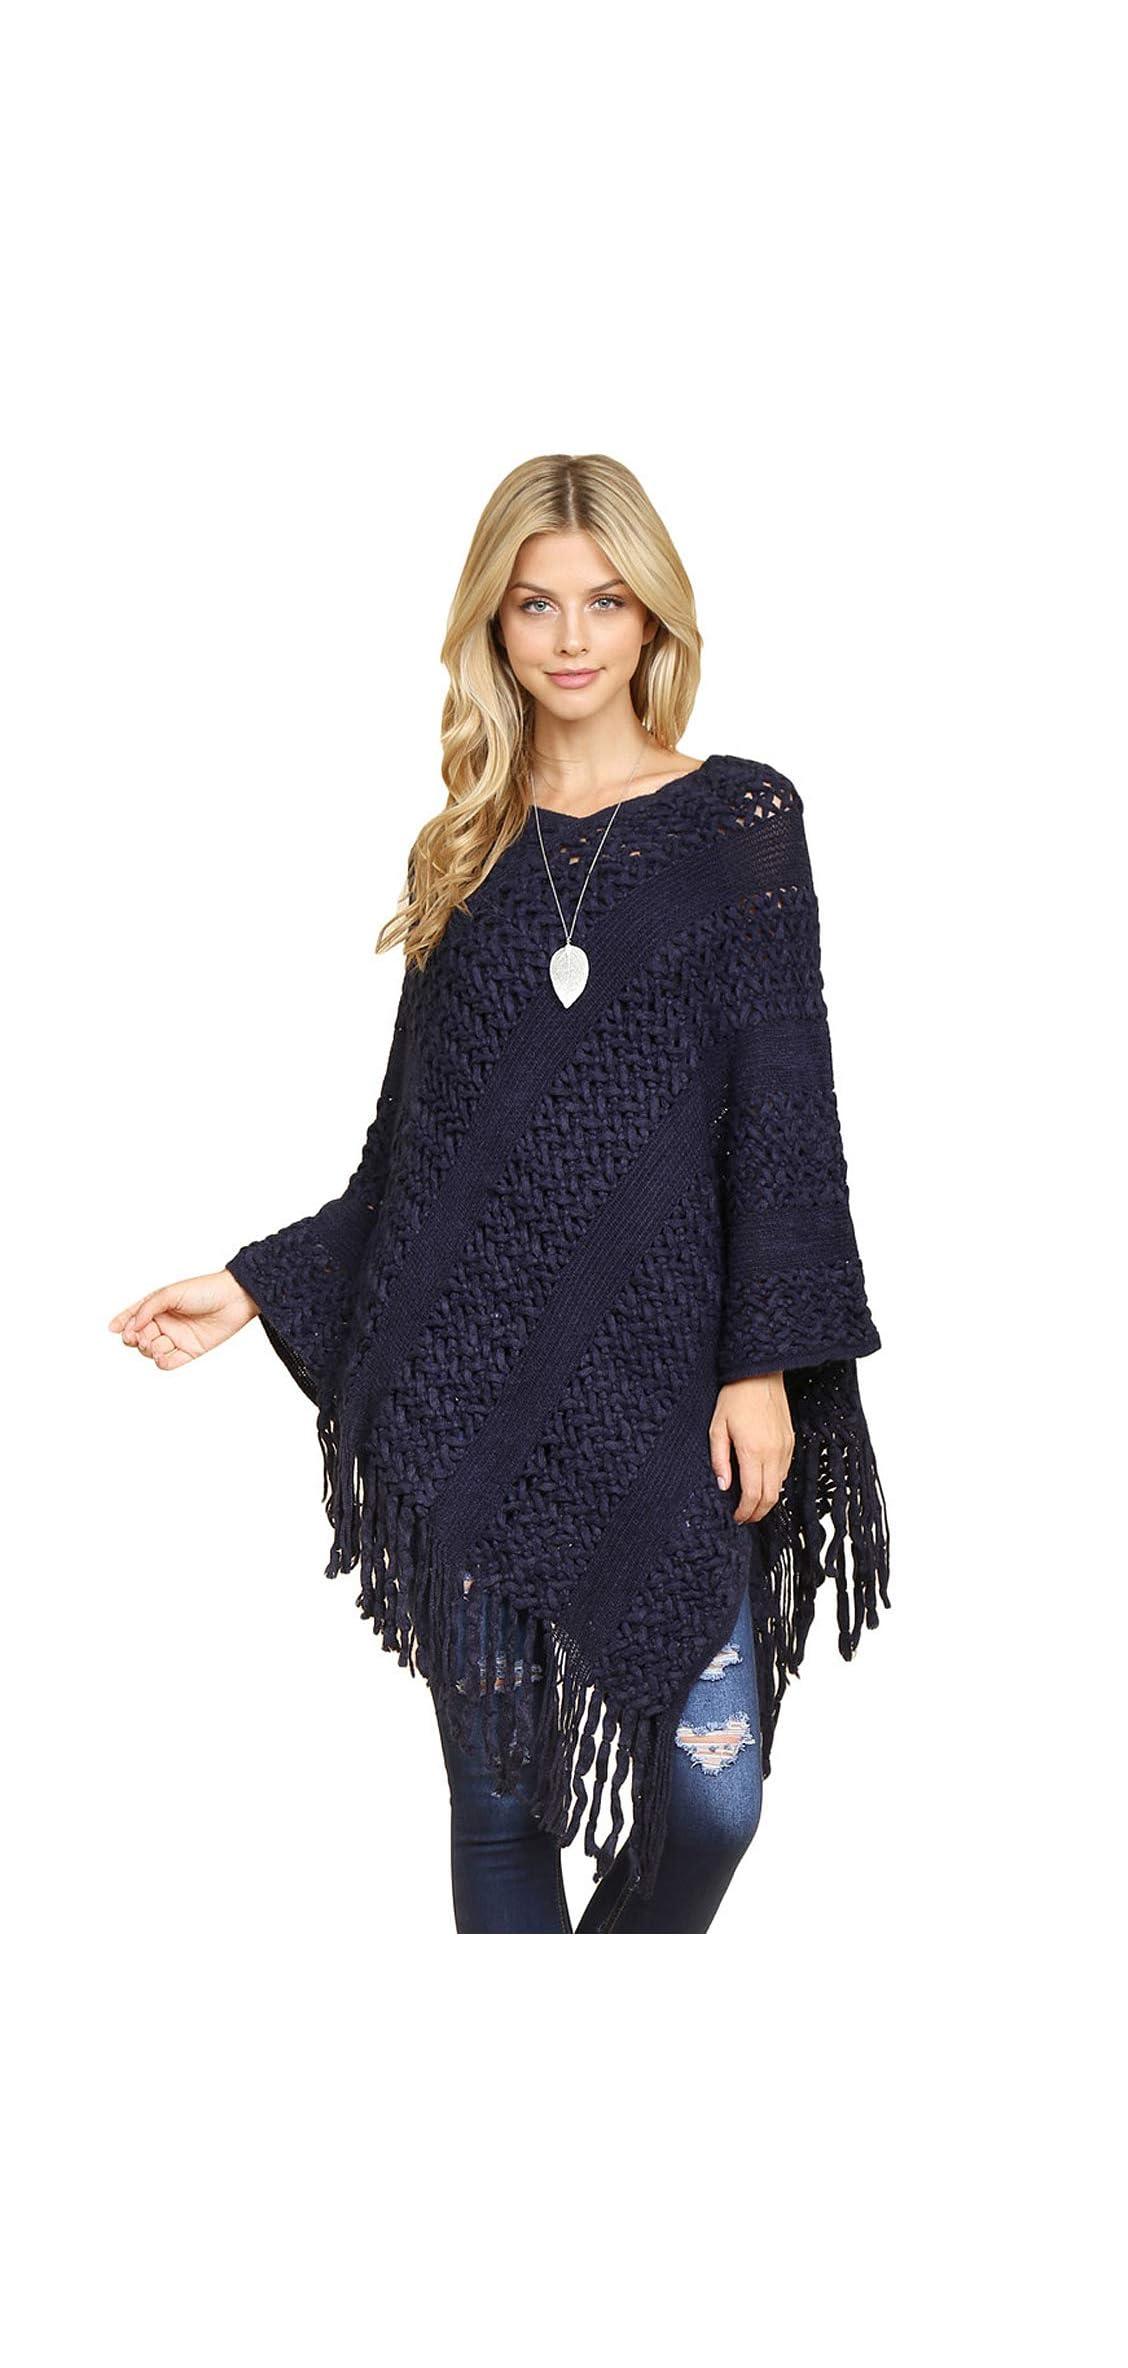 Classic Soft Knit Poncho Shawl Wrap - Basic Warm Pullover Fringe